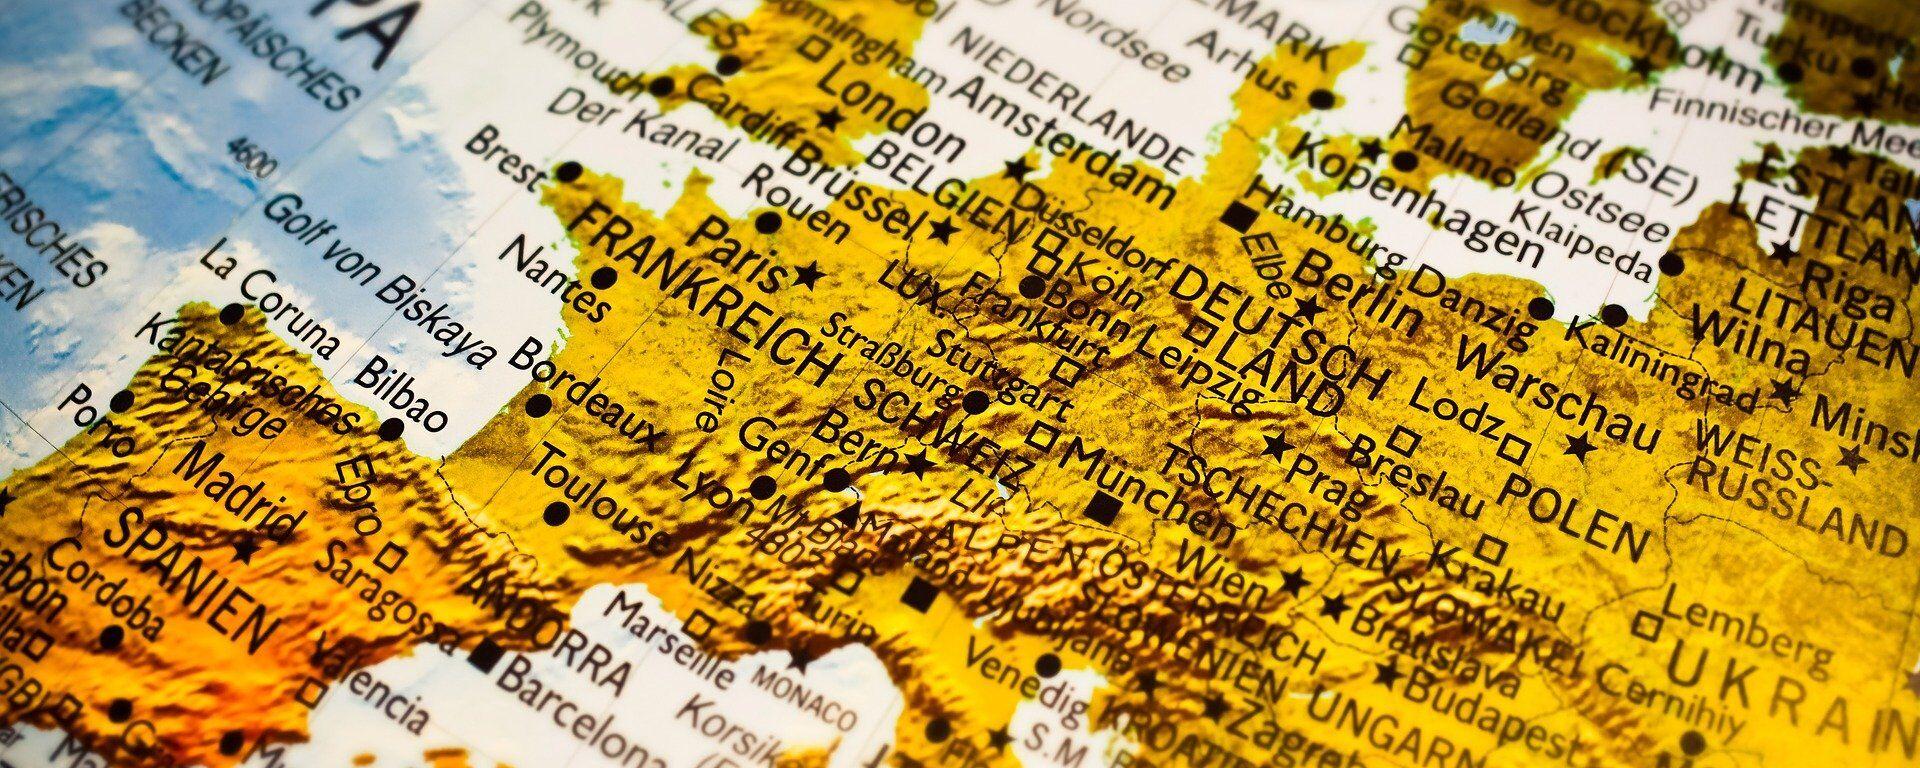 Mapa de Europa - Sputnik Mundo, 1920, 08.05.2020